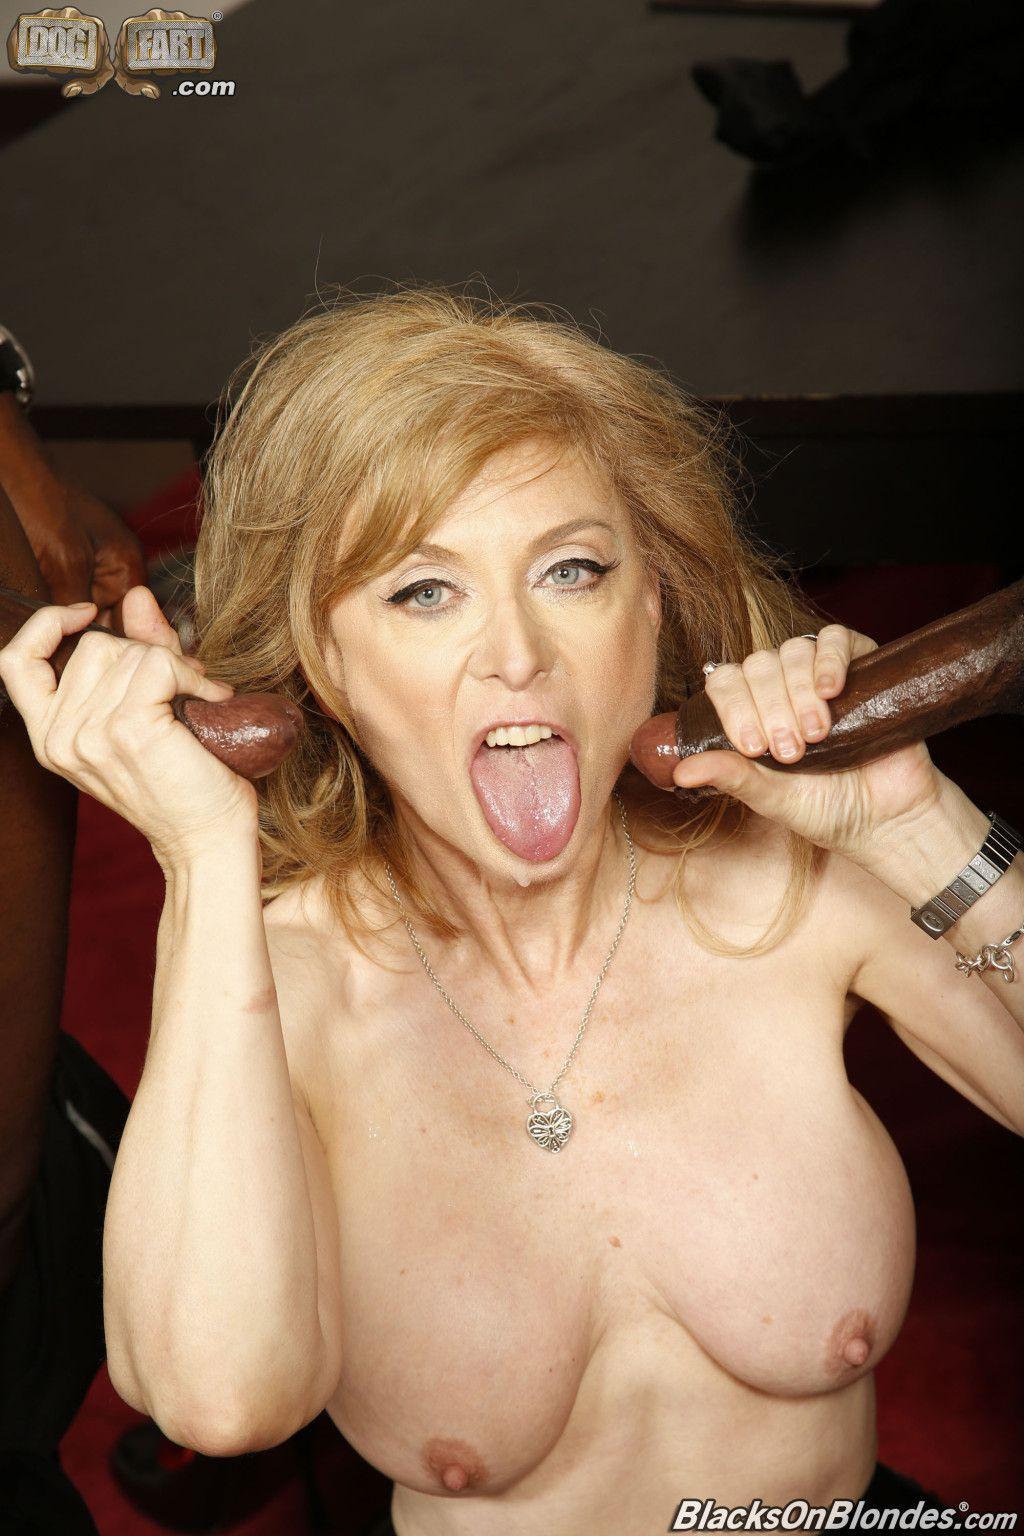 Nina hartley fucking 2 big black dicks at dogfart